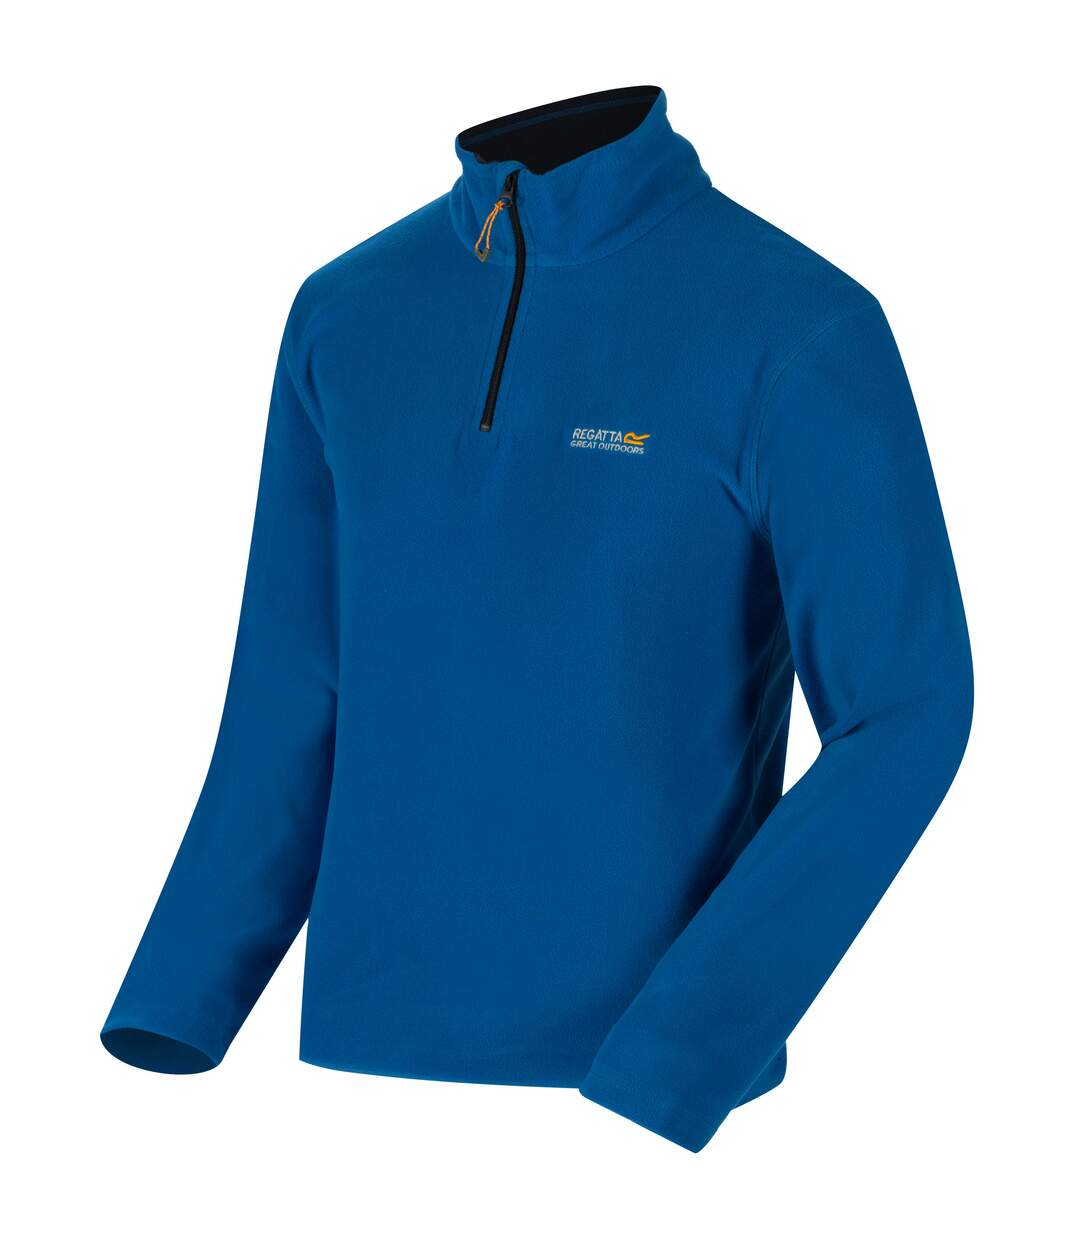 Regatta Great Outdoors Mens Thompson Half Zip Fleece Top (Oxford Blue/Navy) - UTRG1390